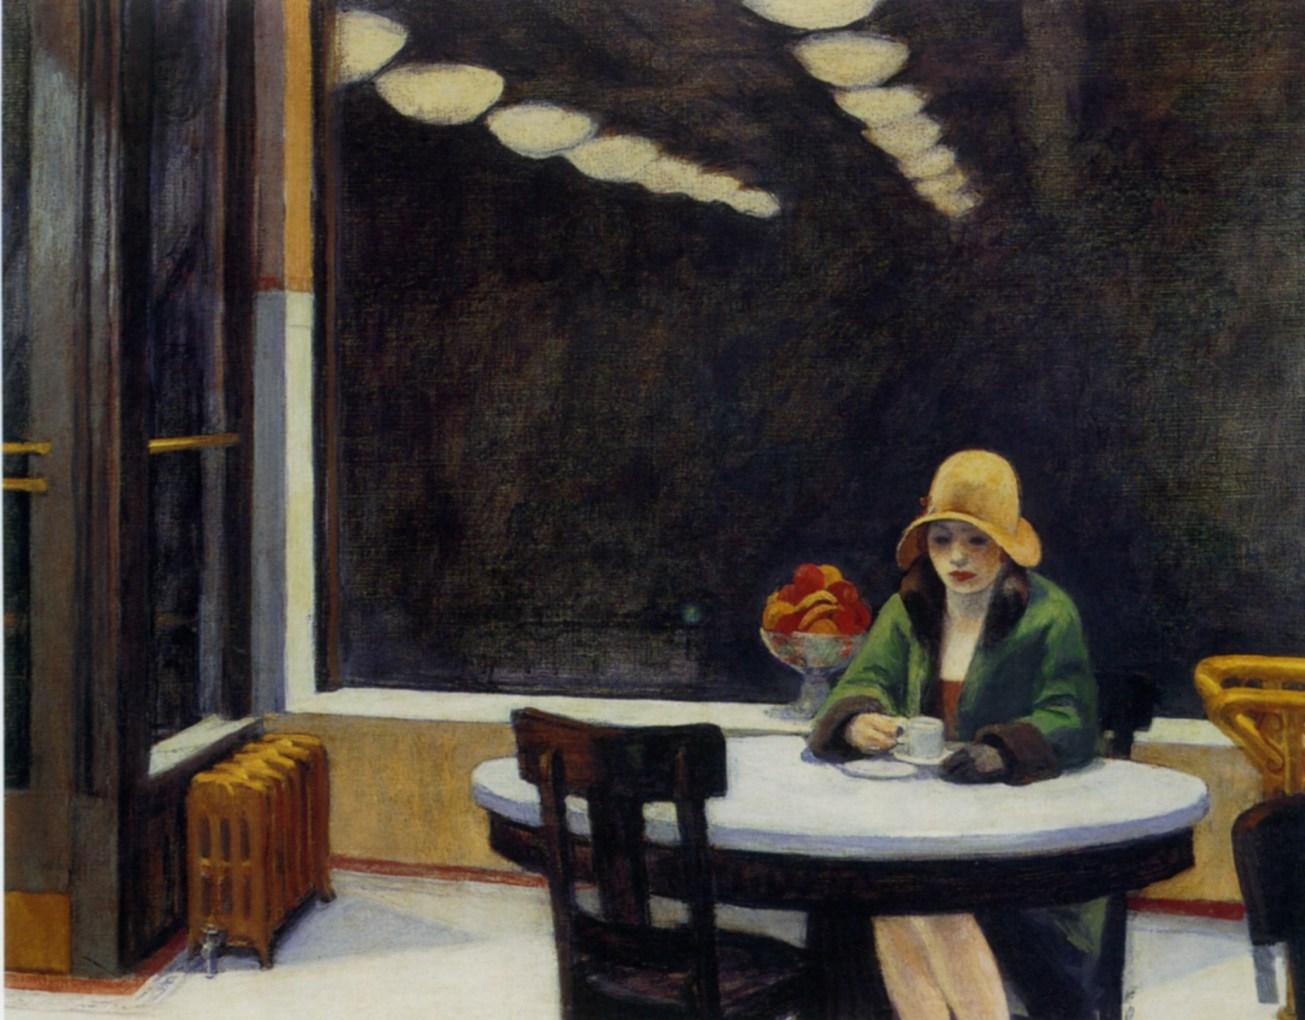 1927-edward-hopper-automat-american-painting-copy.jpg